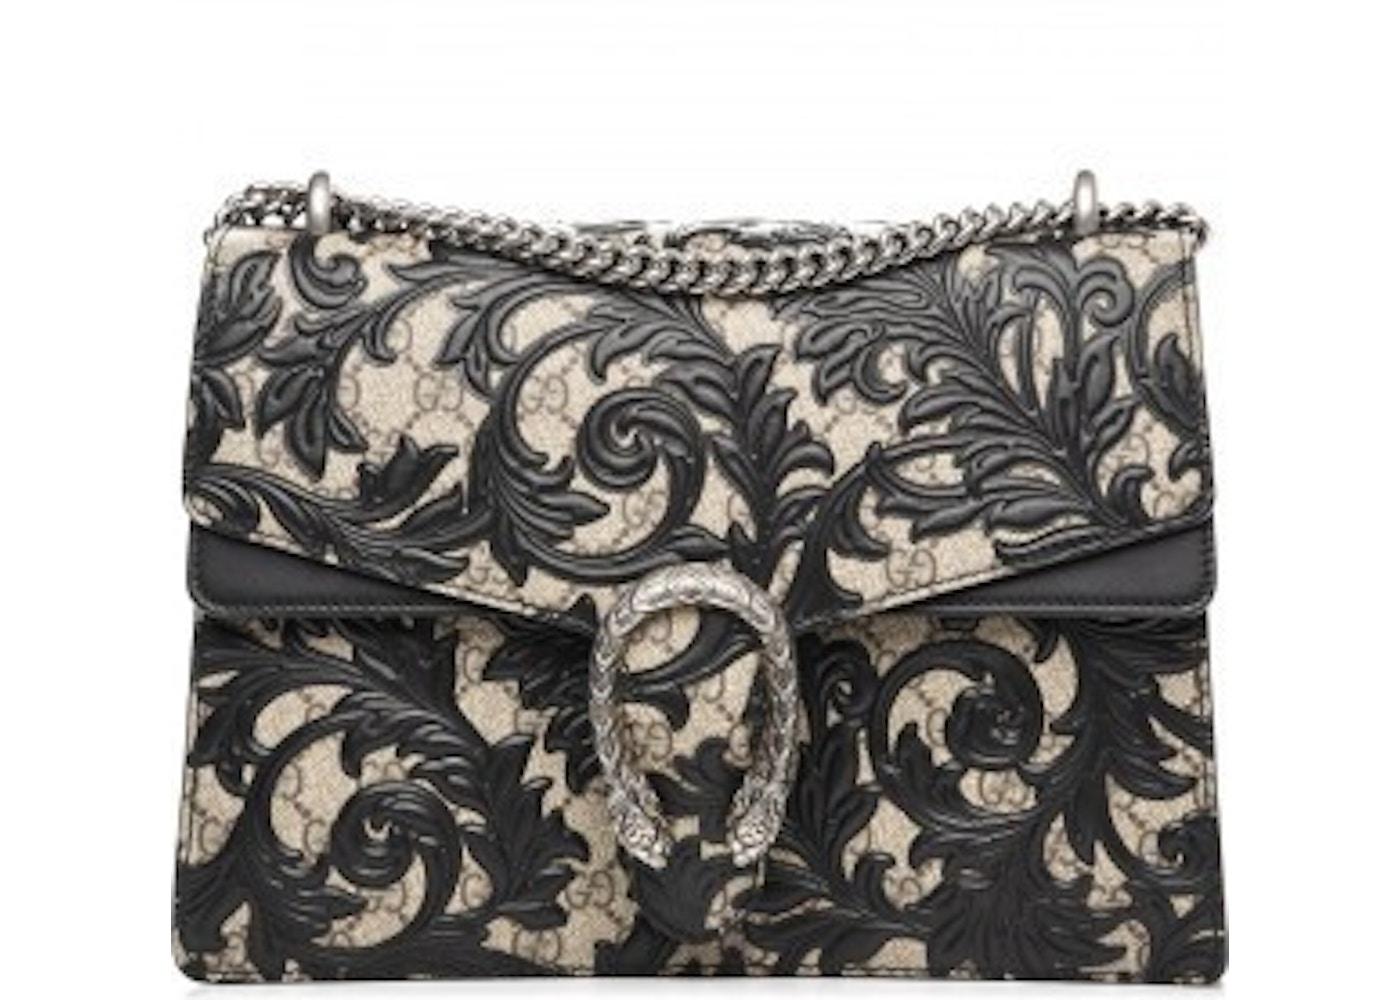 1f06d2d272dc Buy & Sell Gucci Handbags - Last Sale